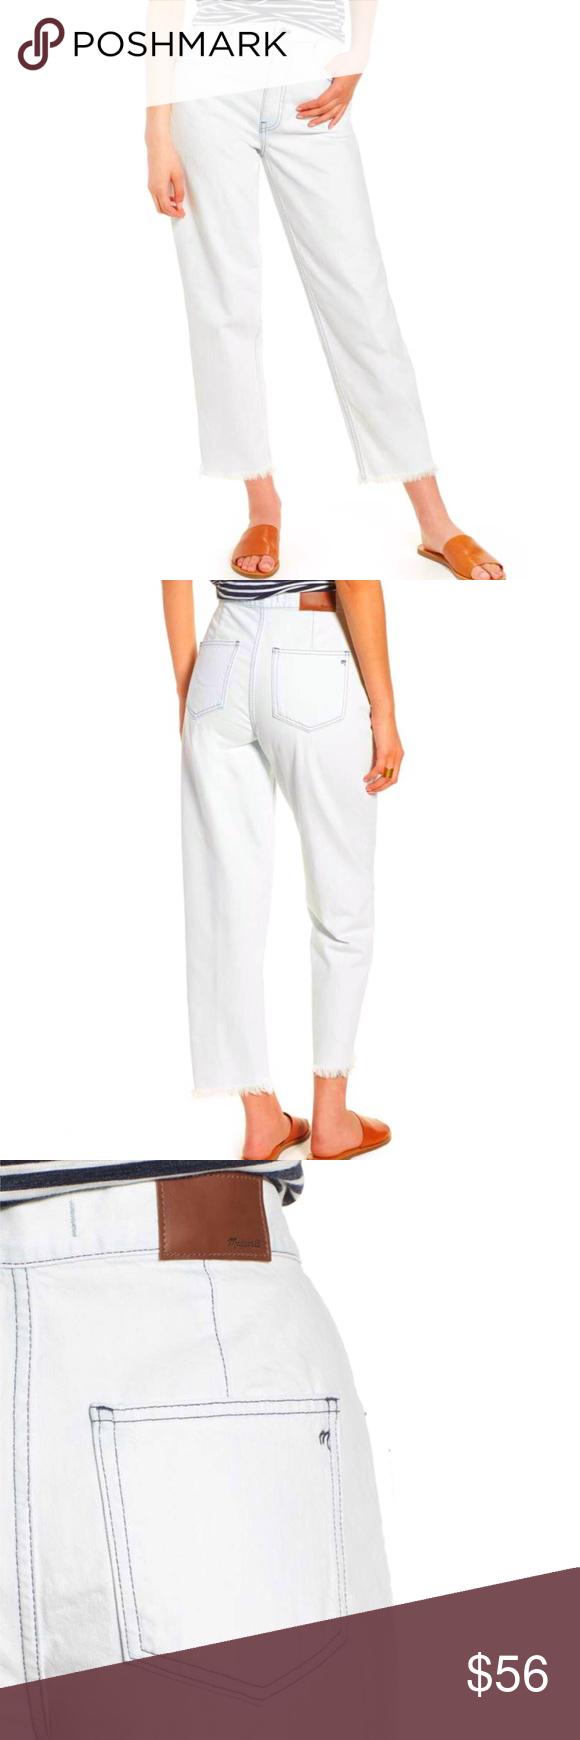 MADEWELL Tapered WideLeg Raw Hem Crop Jeans! 25 MADEWELL